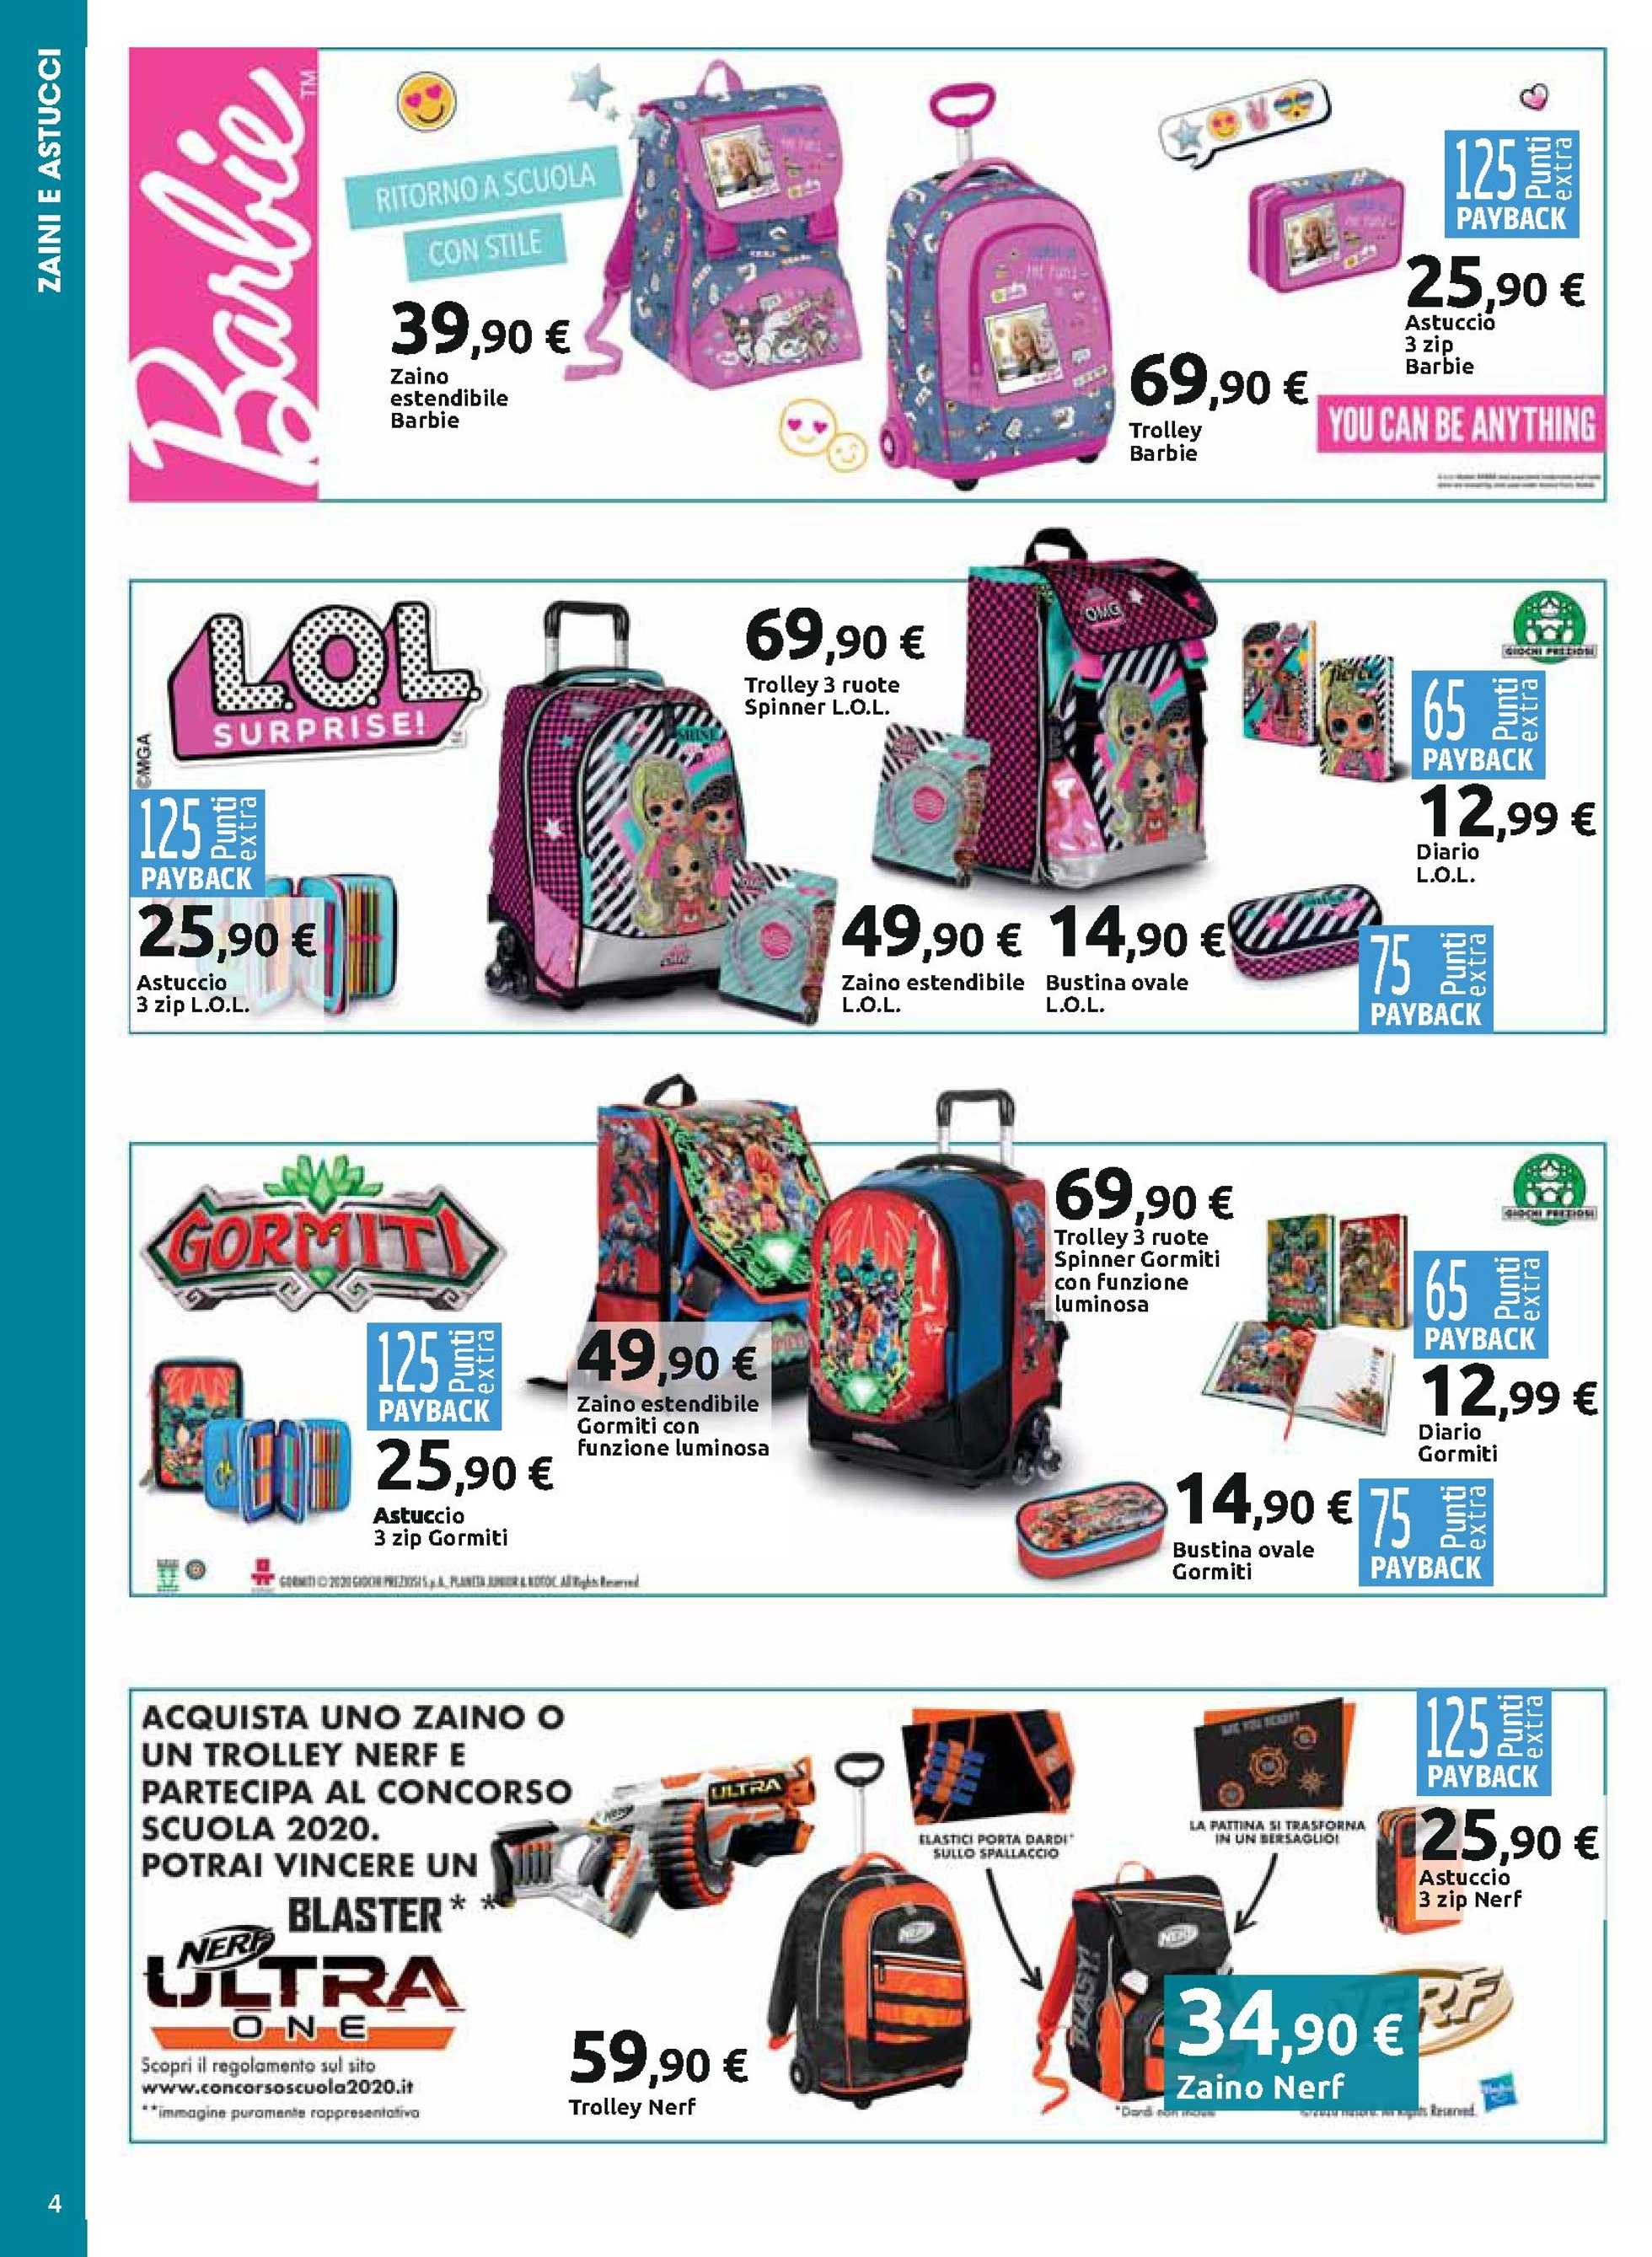 Carrefour Iper - offerte valide dal 28.07.2020 al 30.08.2020 - pagina 4.